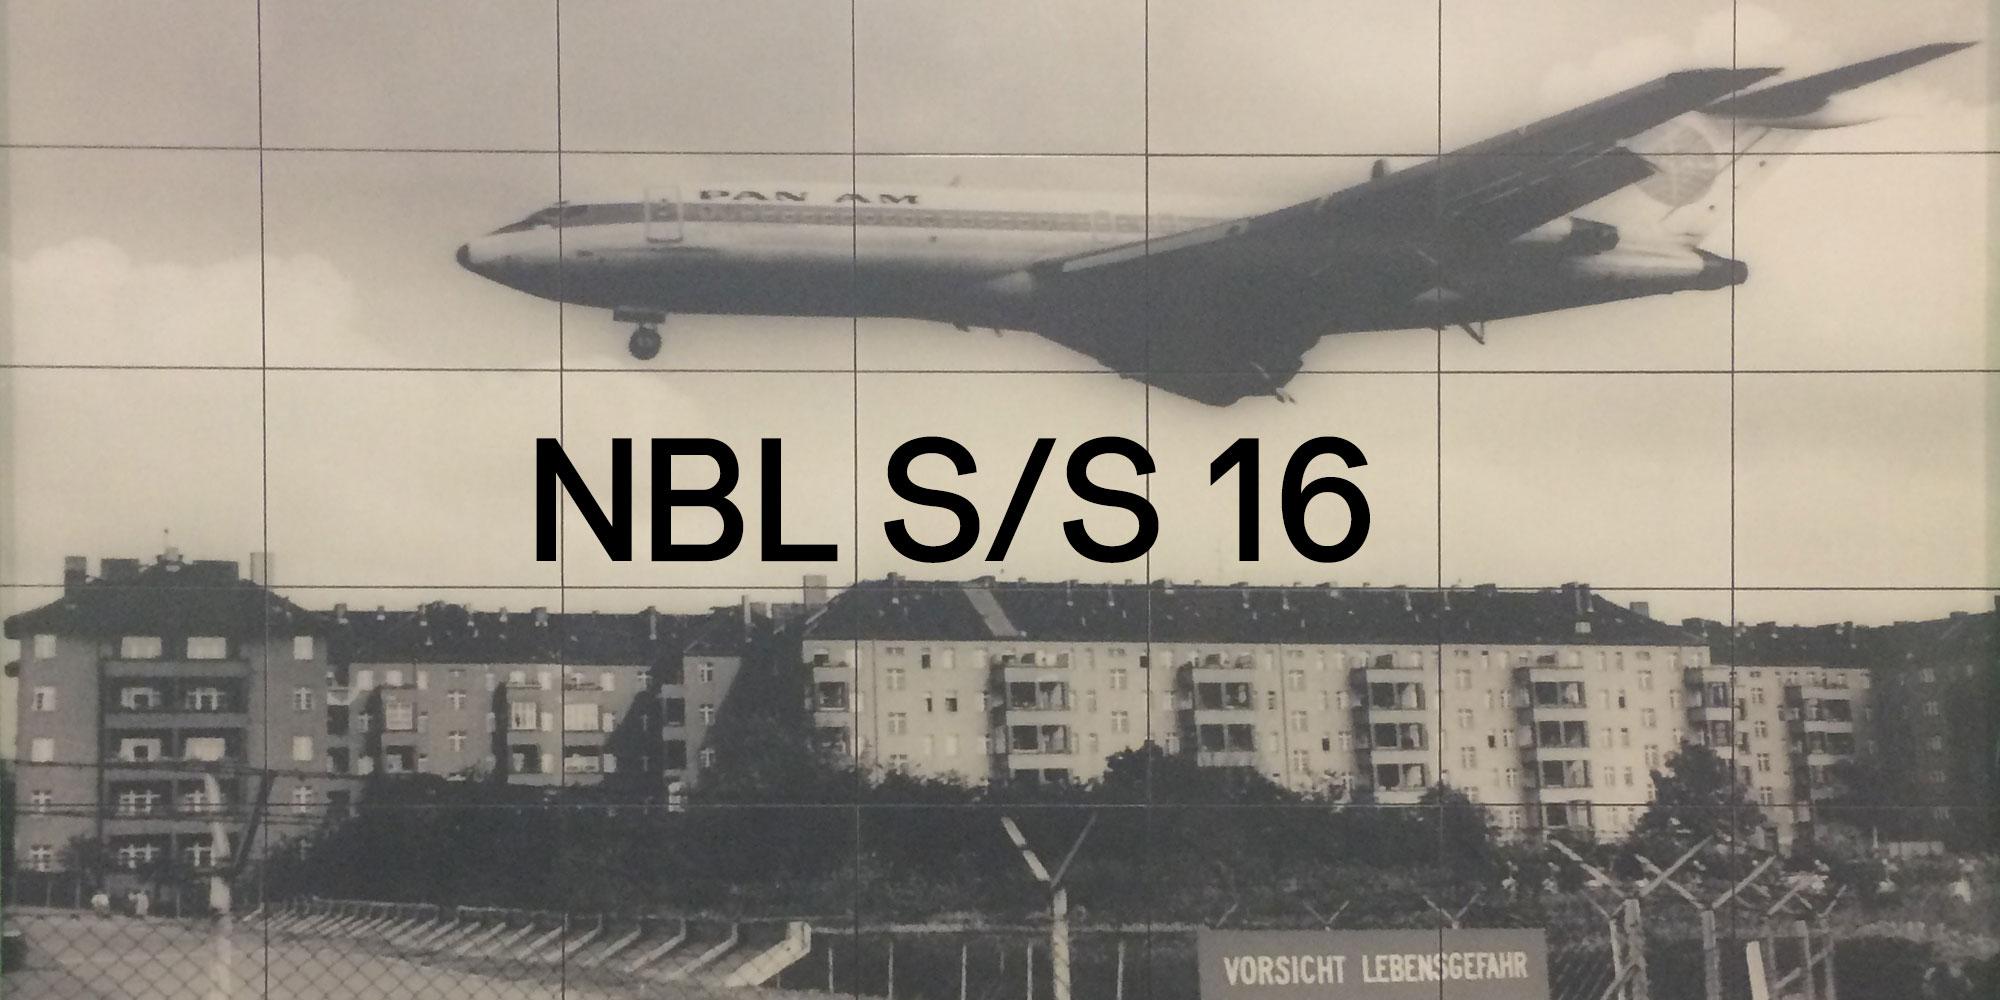 NBLSS16